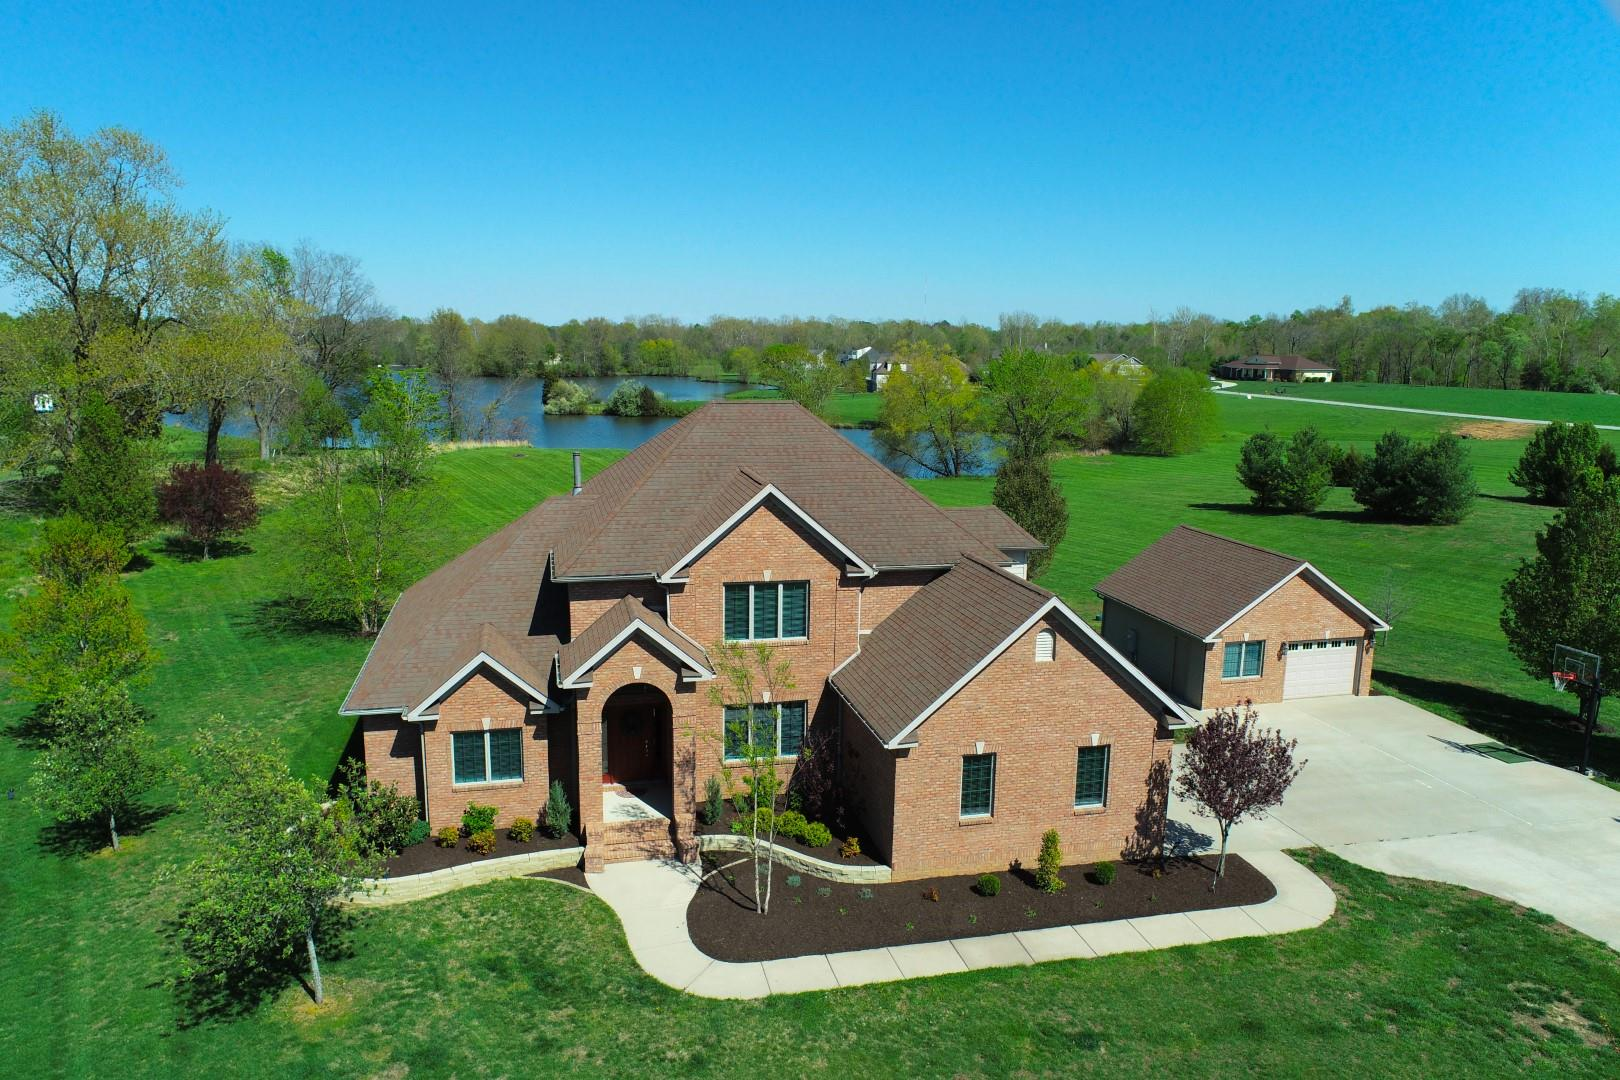 3850 ARIEL Property Photo - Murphysboro, IL real estate listing